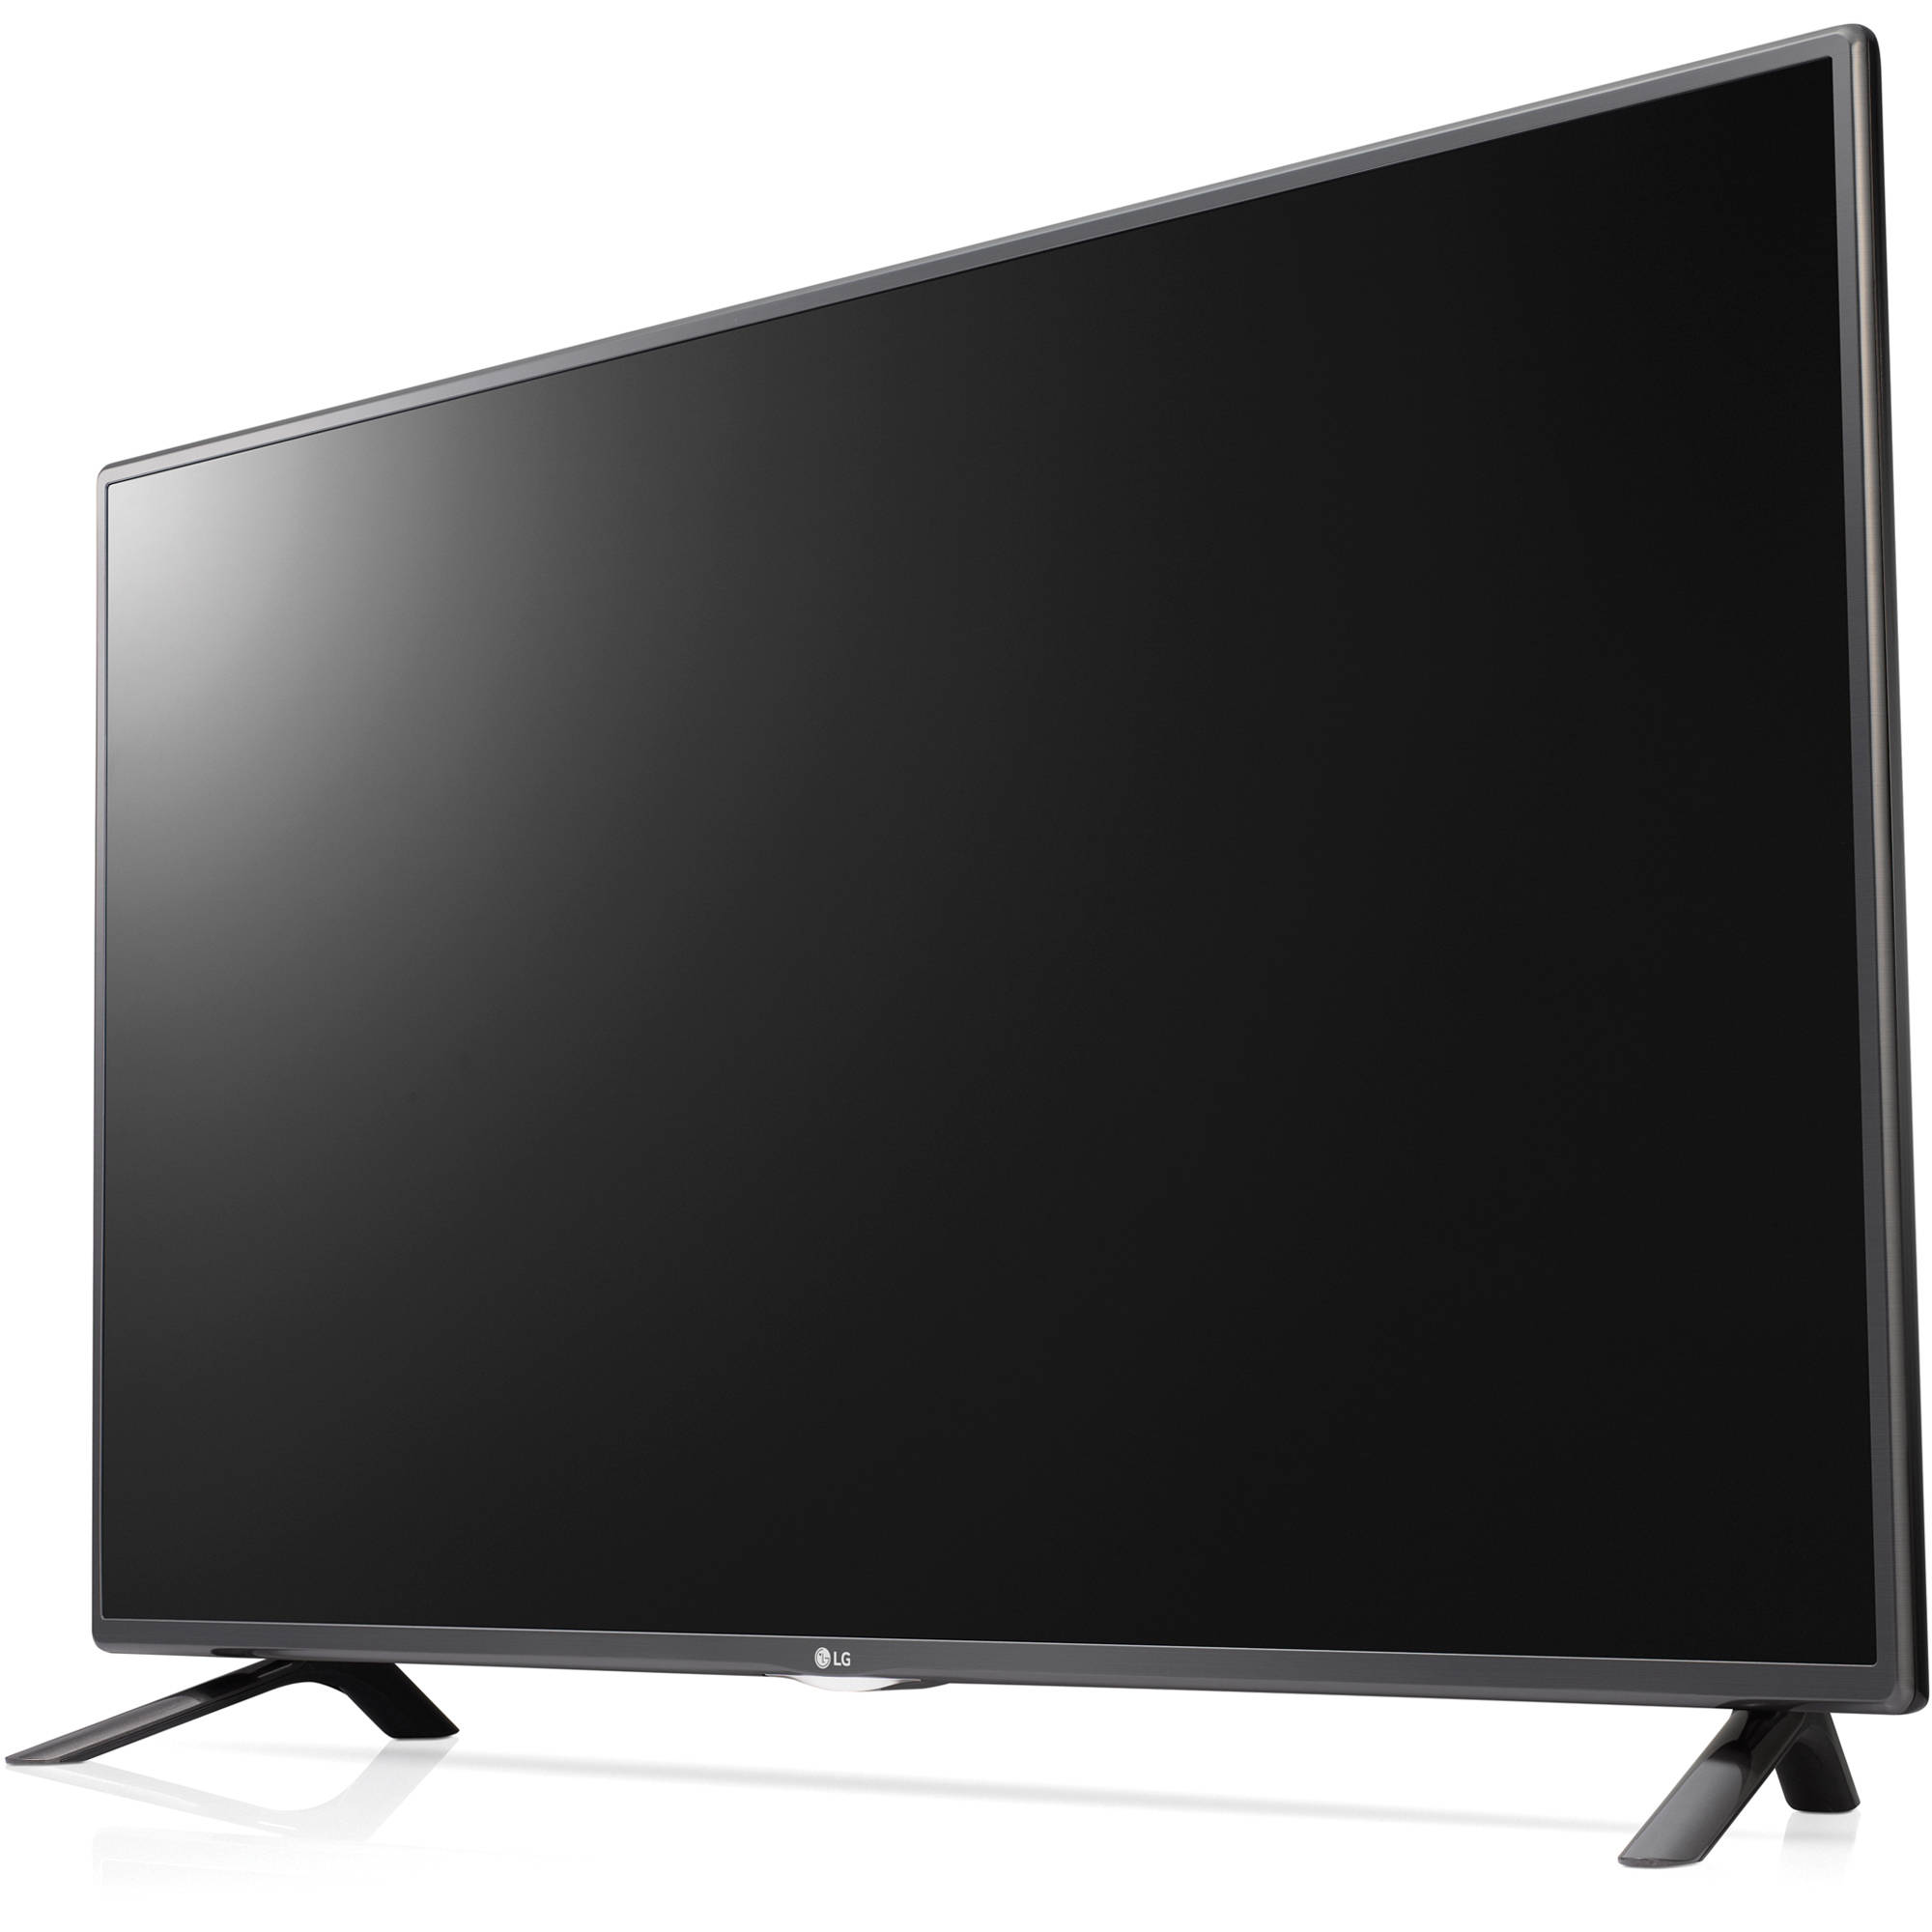 lg lf6100 series 55 class full hd smart led tv 55lf6100. Black Bedroom Furniture Sets. Home Design Ideas